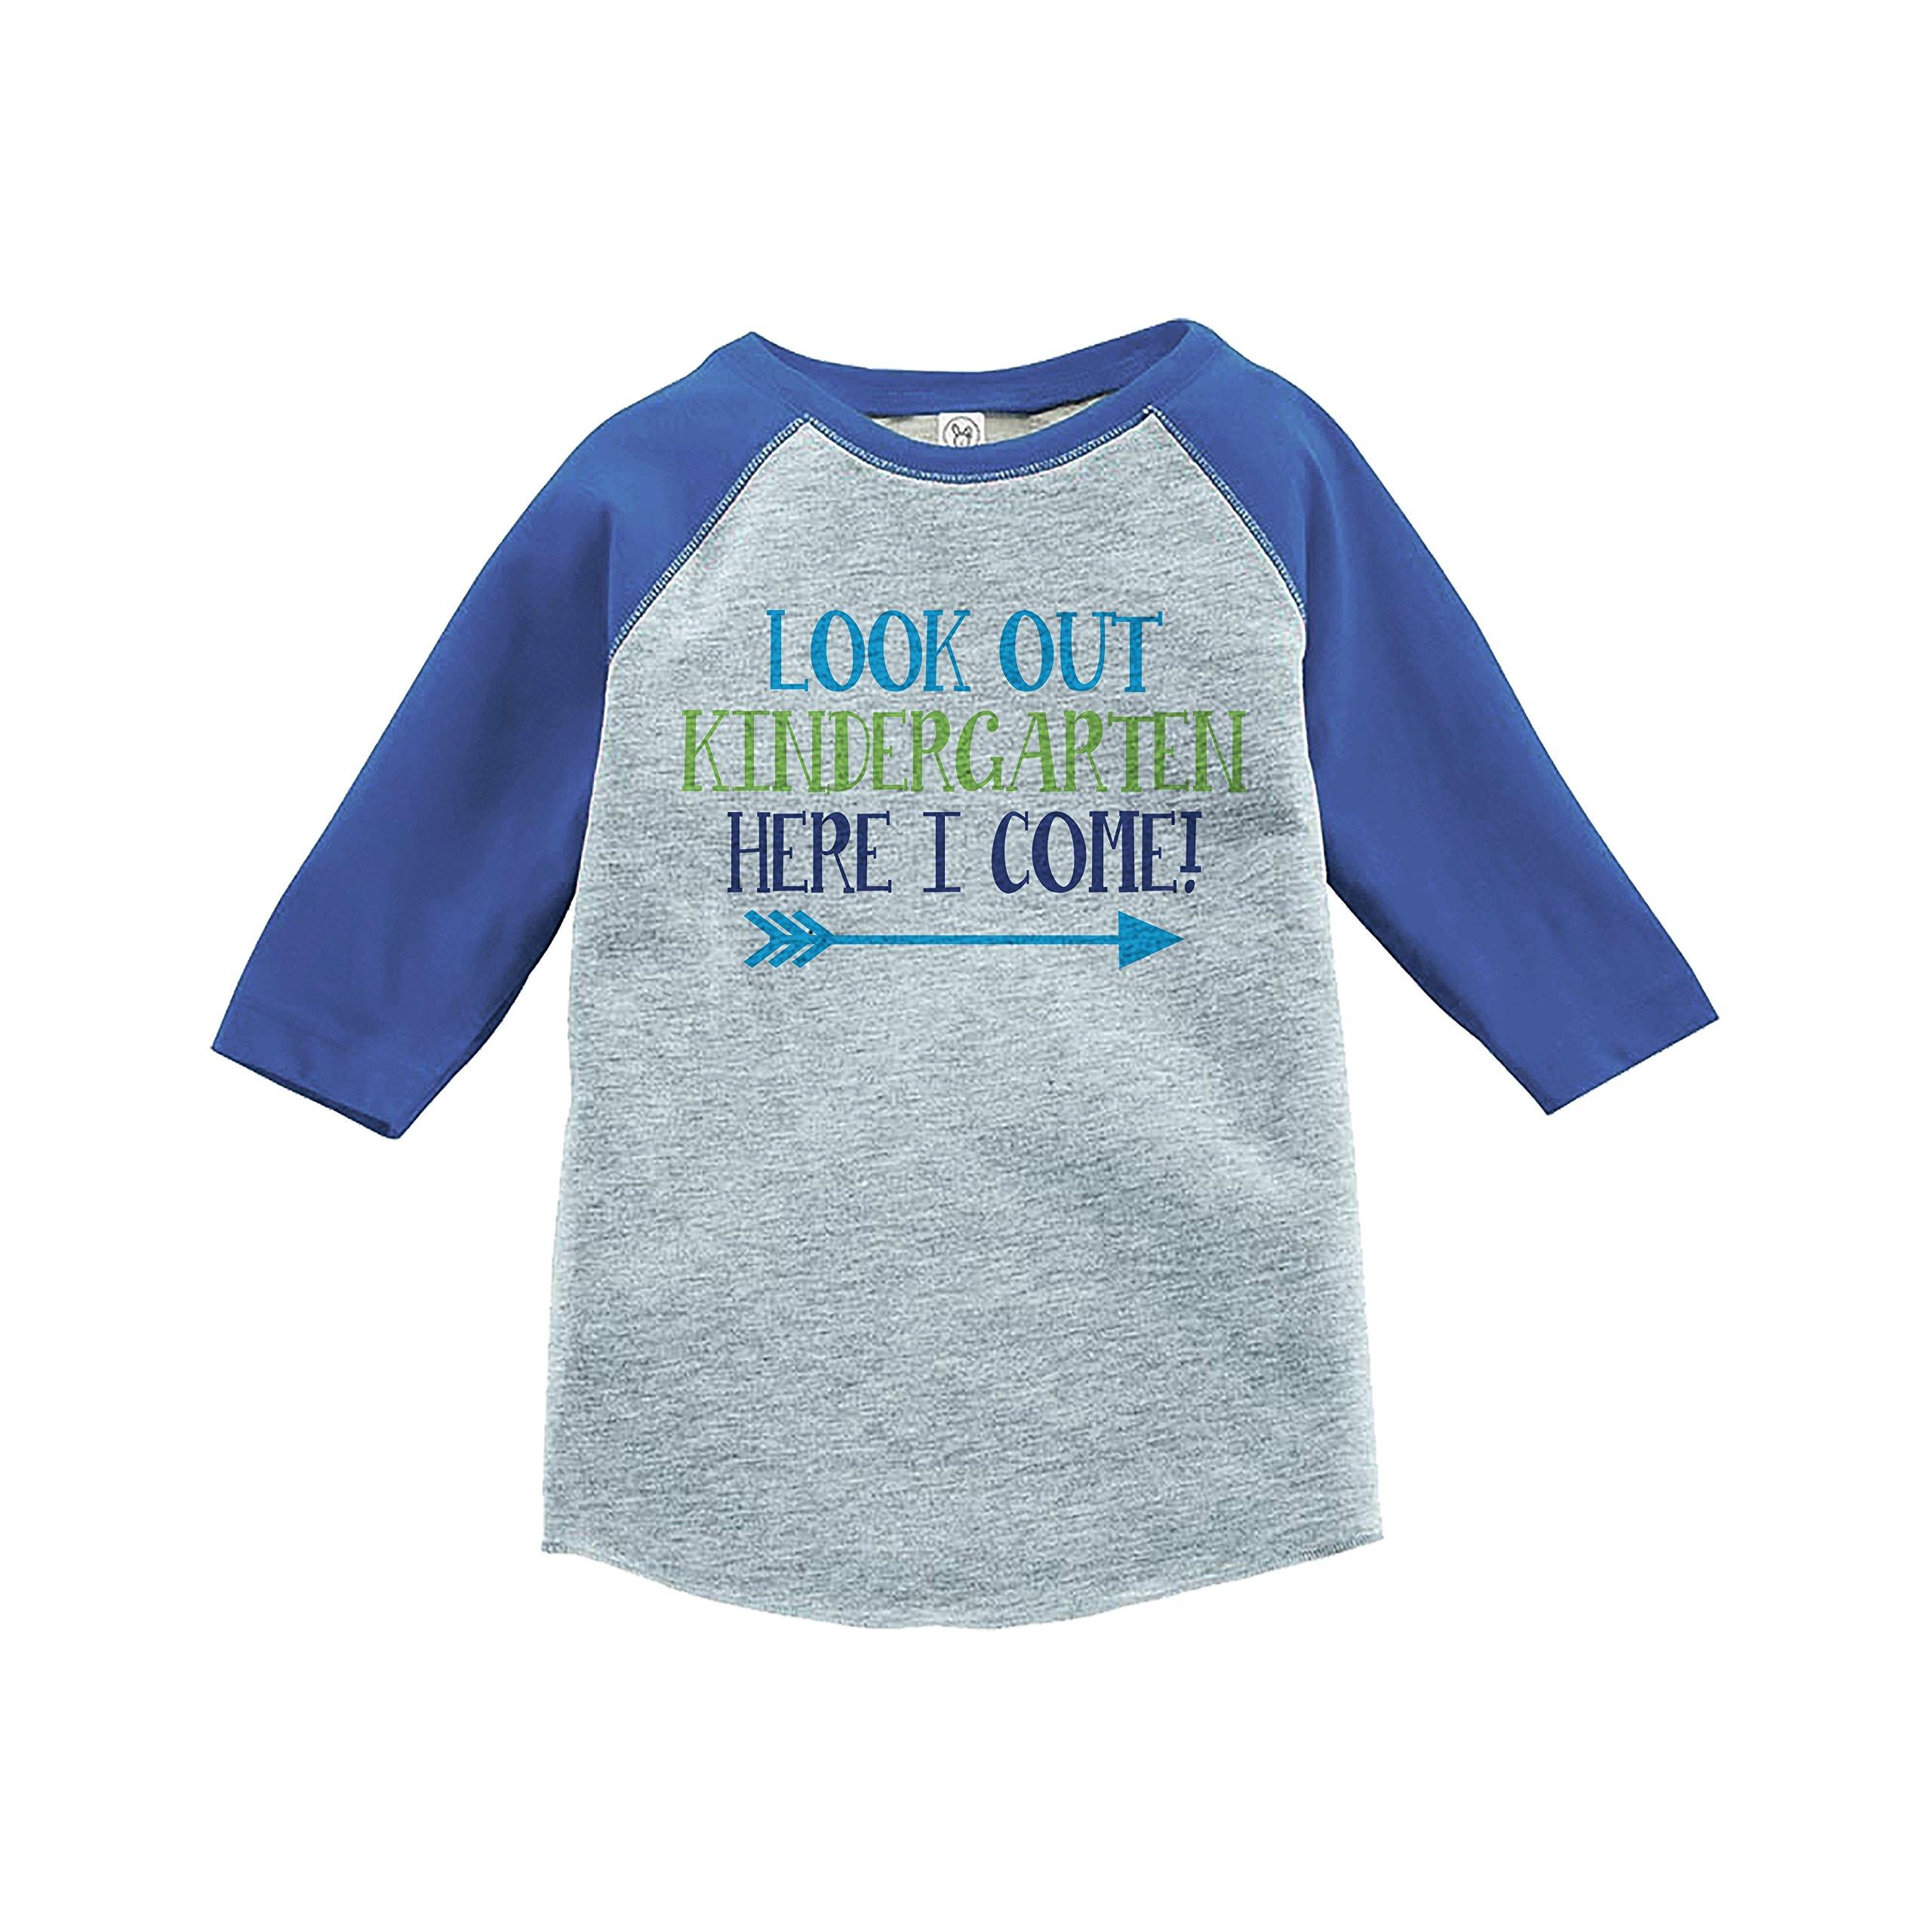 7 ate 9 Apparel Kids Look Out Kindergarten School Shirt